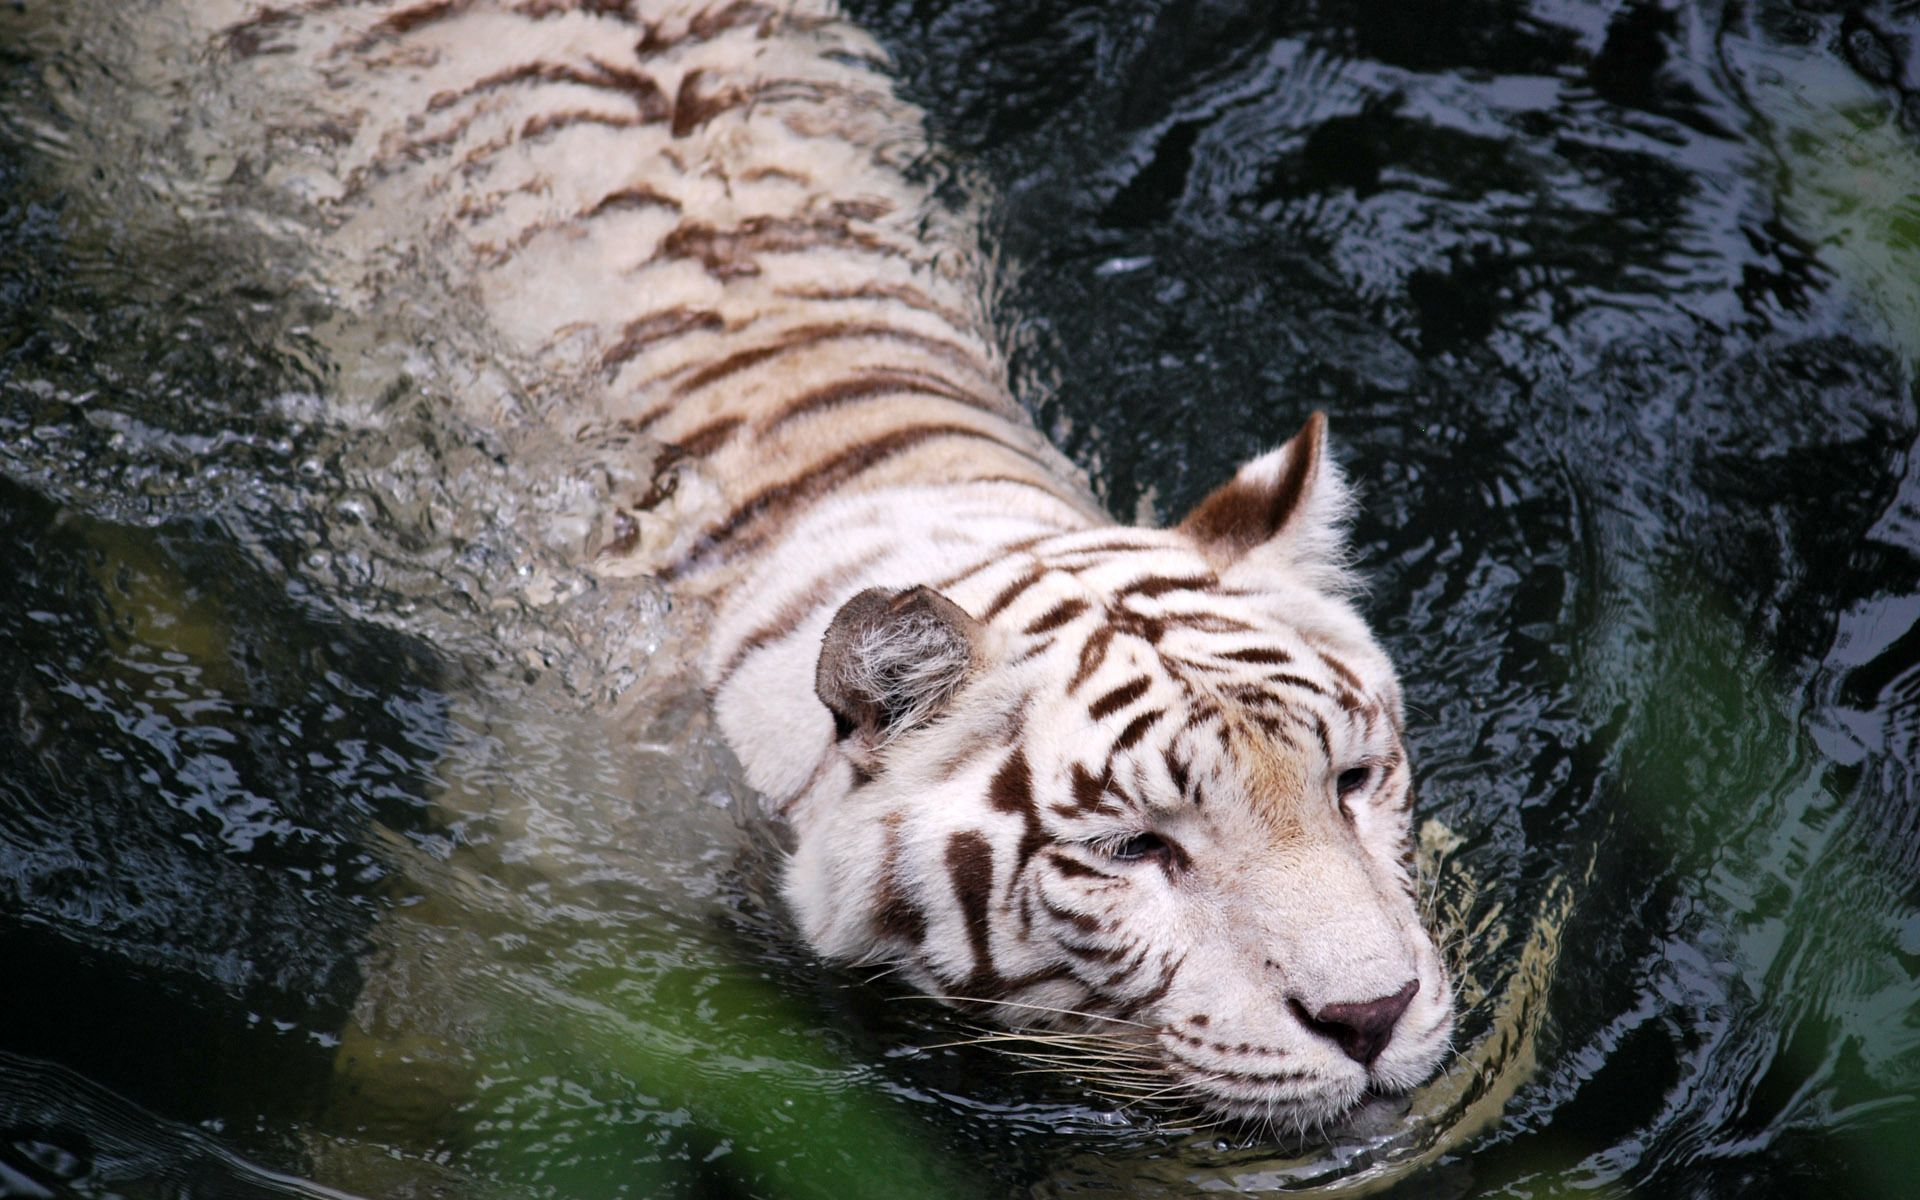 101836 download wallpaper Animals, Tiger, Albino, To Swim, Swim, Water, Big Cat, Predator screensavers and pictures for free